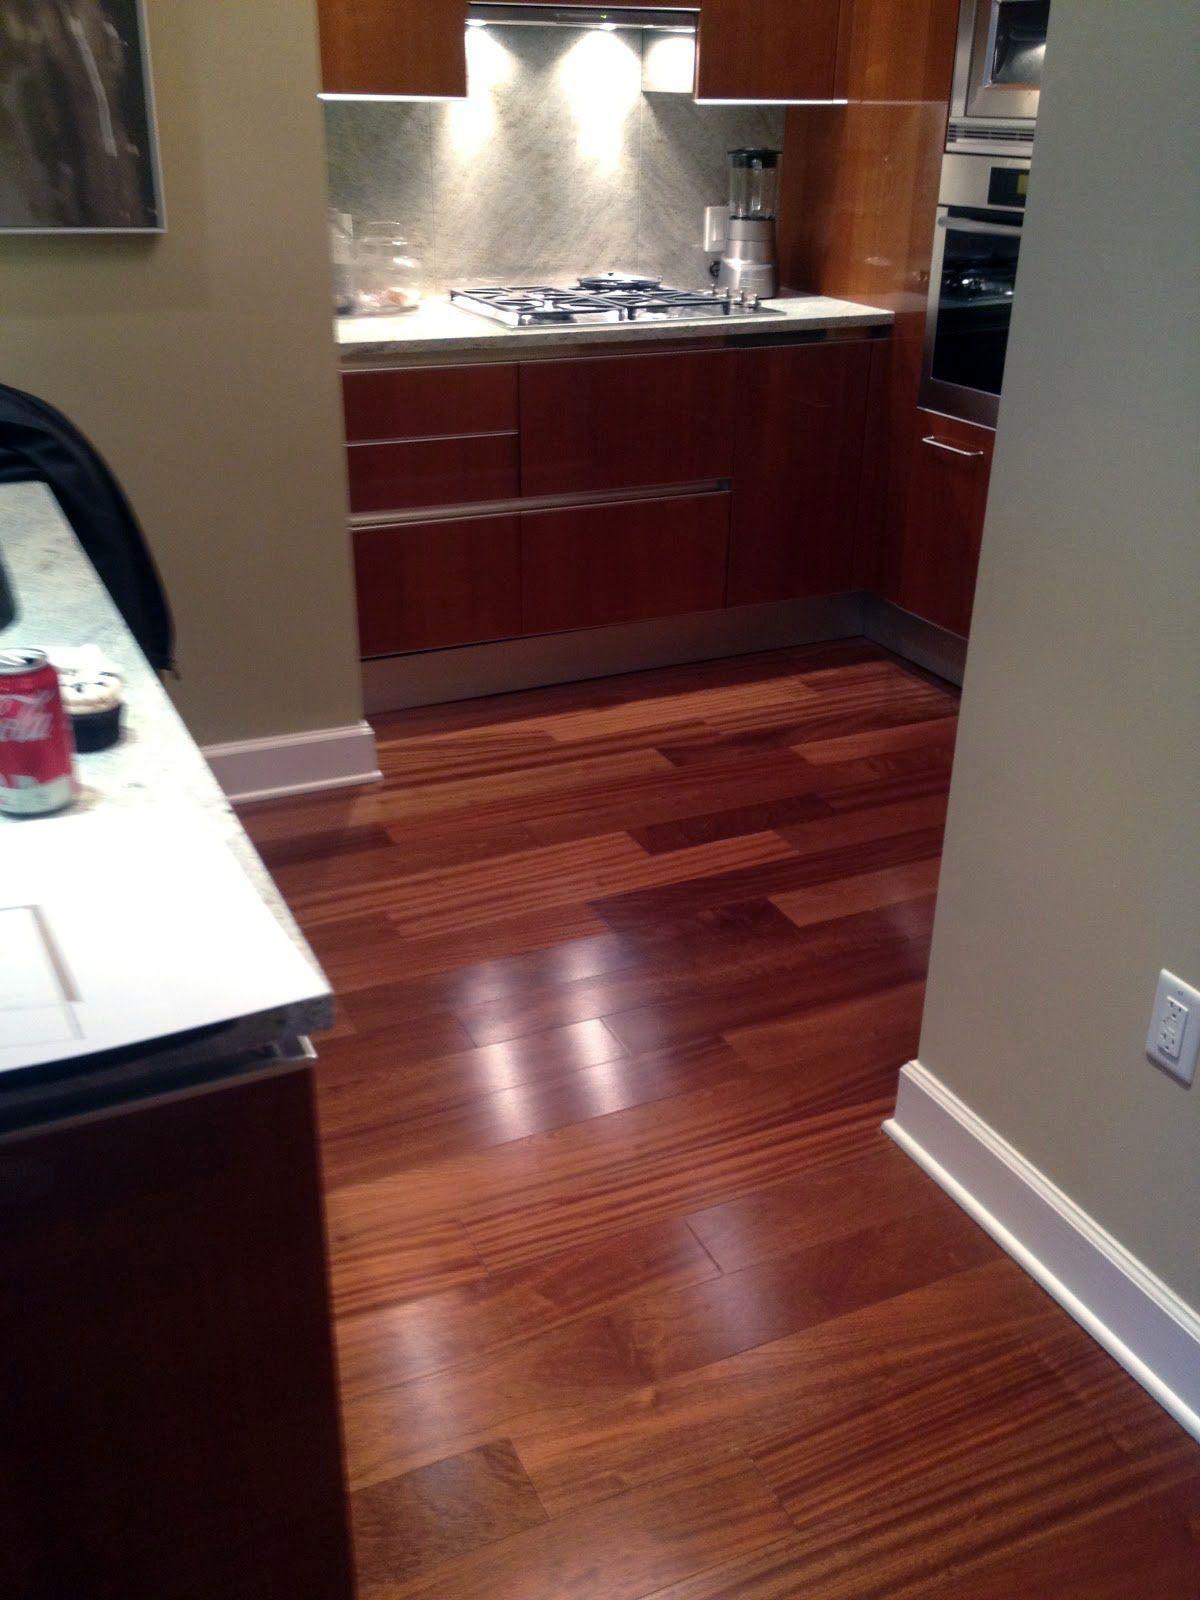 Leading Restroom Floor Covering Options With Images Laminate Flooring In Kitchen Best Laminate Wood Floor Bathroom